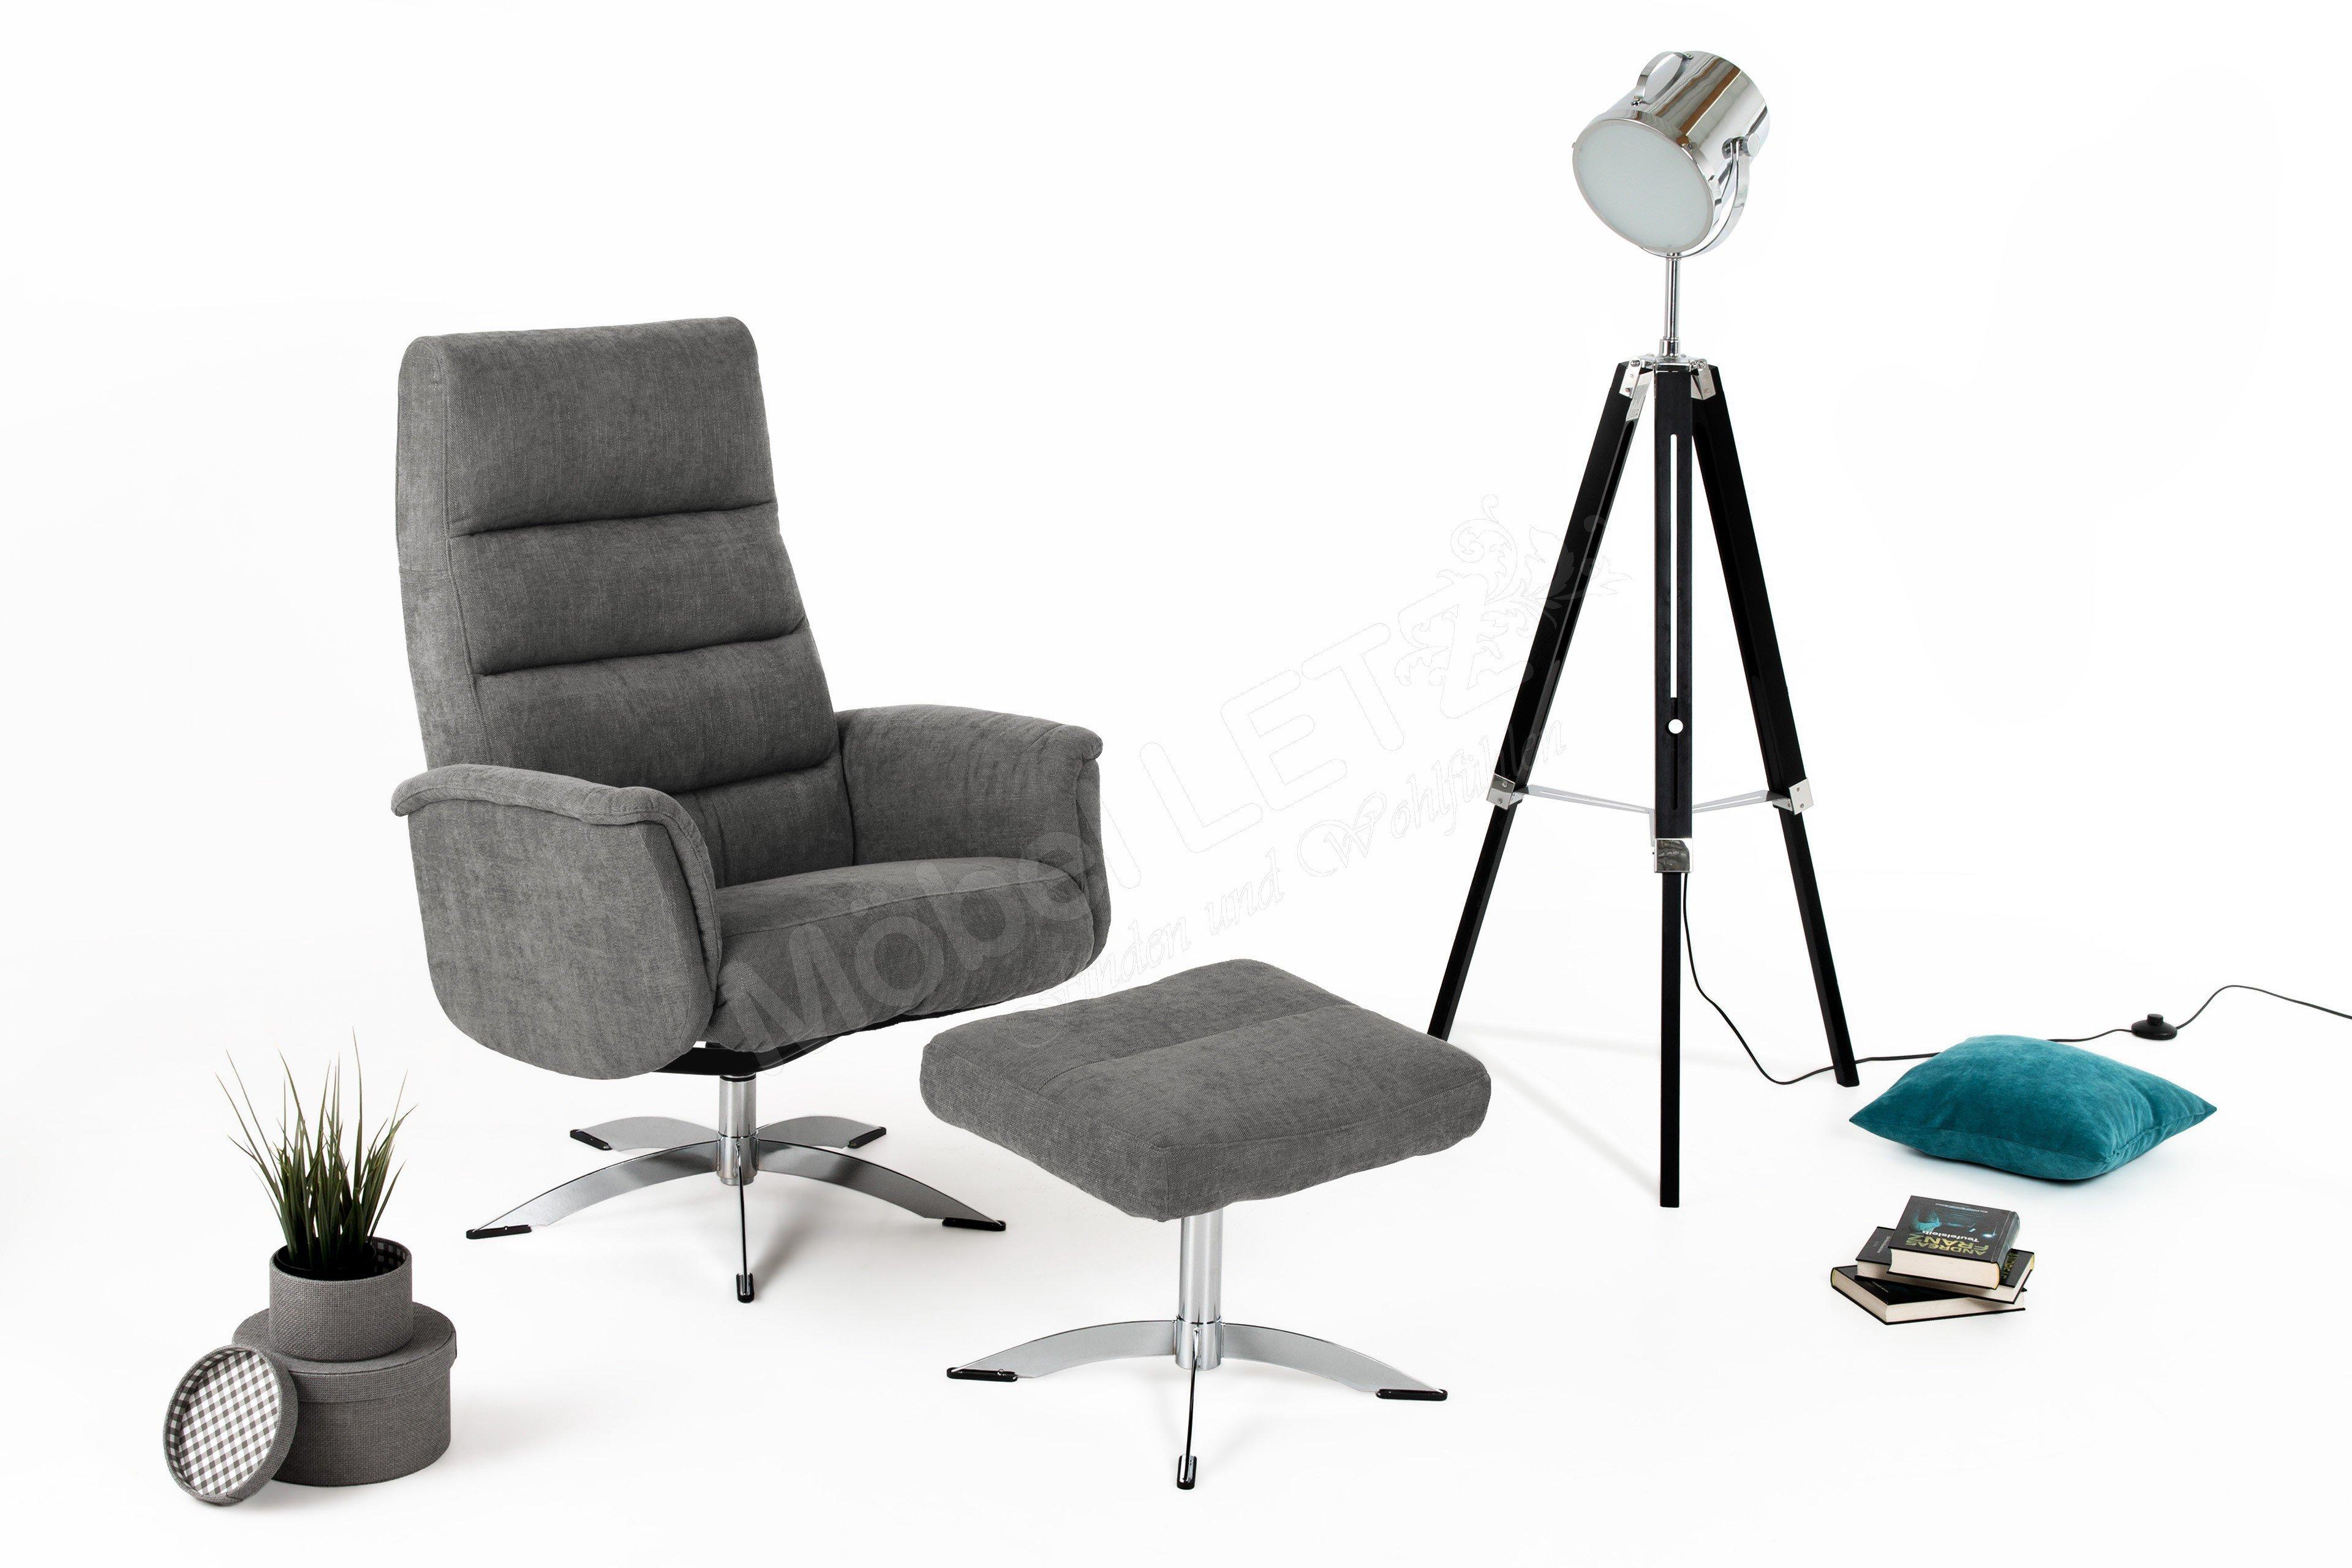 Hjort Knudsen 3252 TV-Sessel hellgrau | Möbel Letz - Ihr Online-Shop